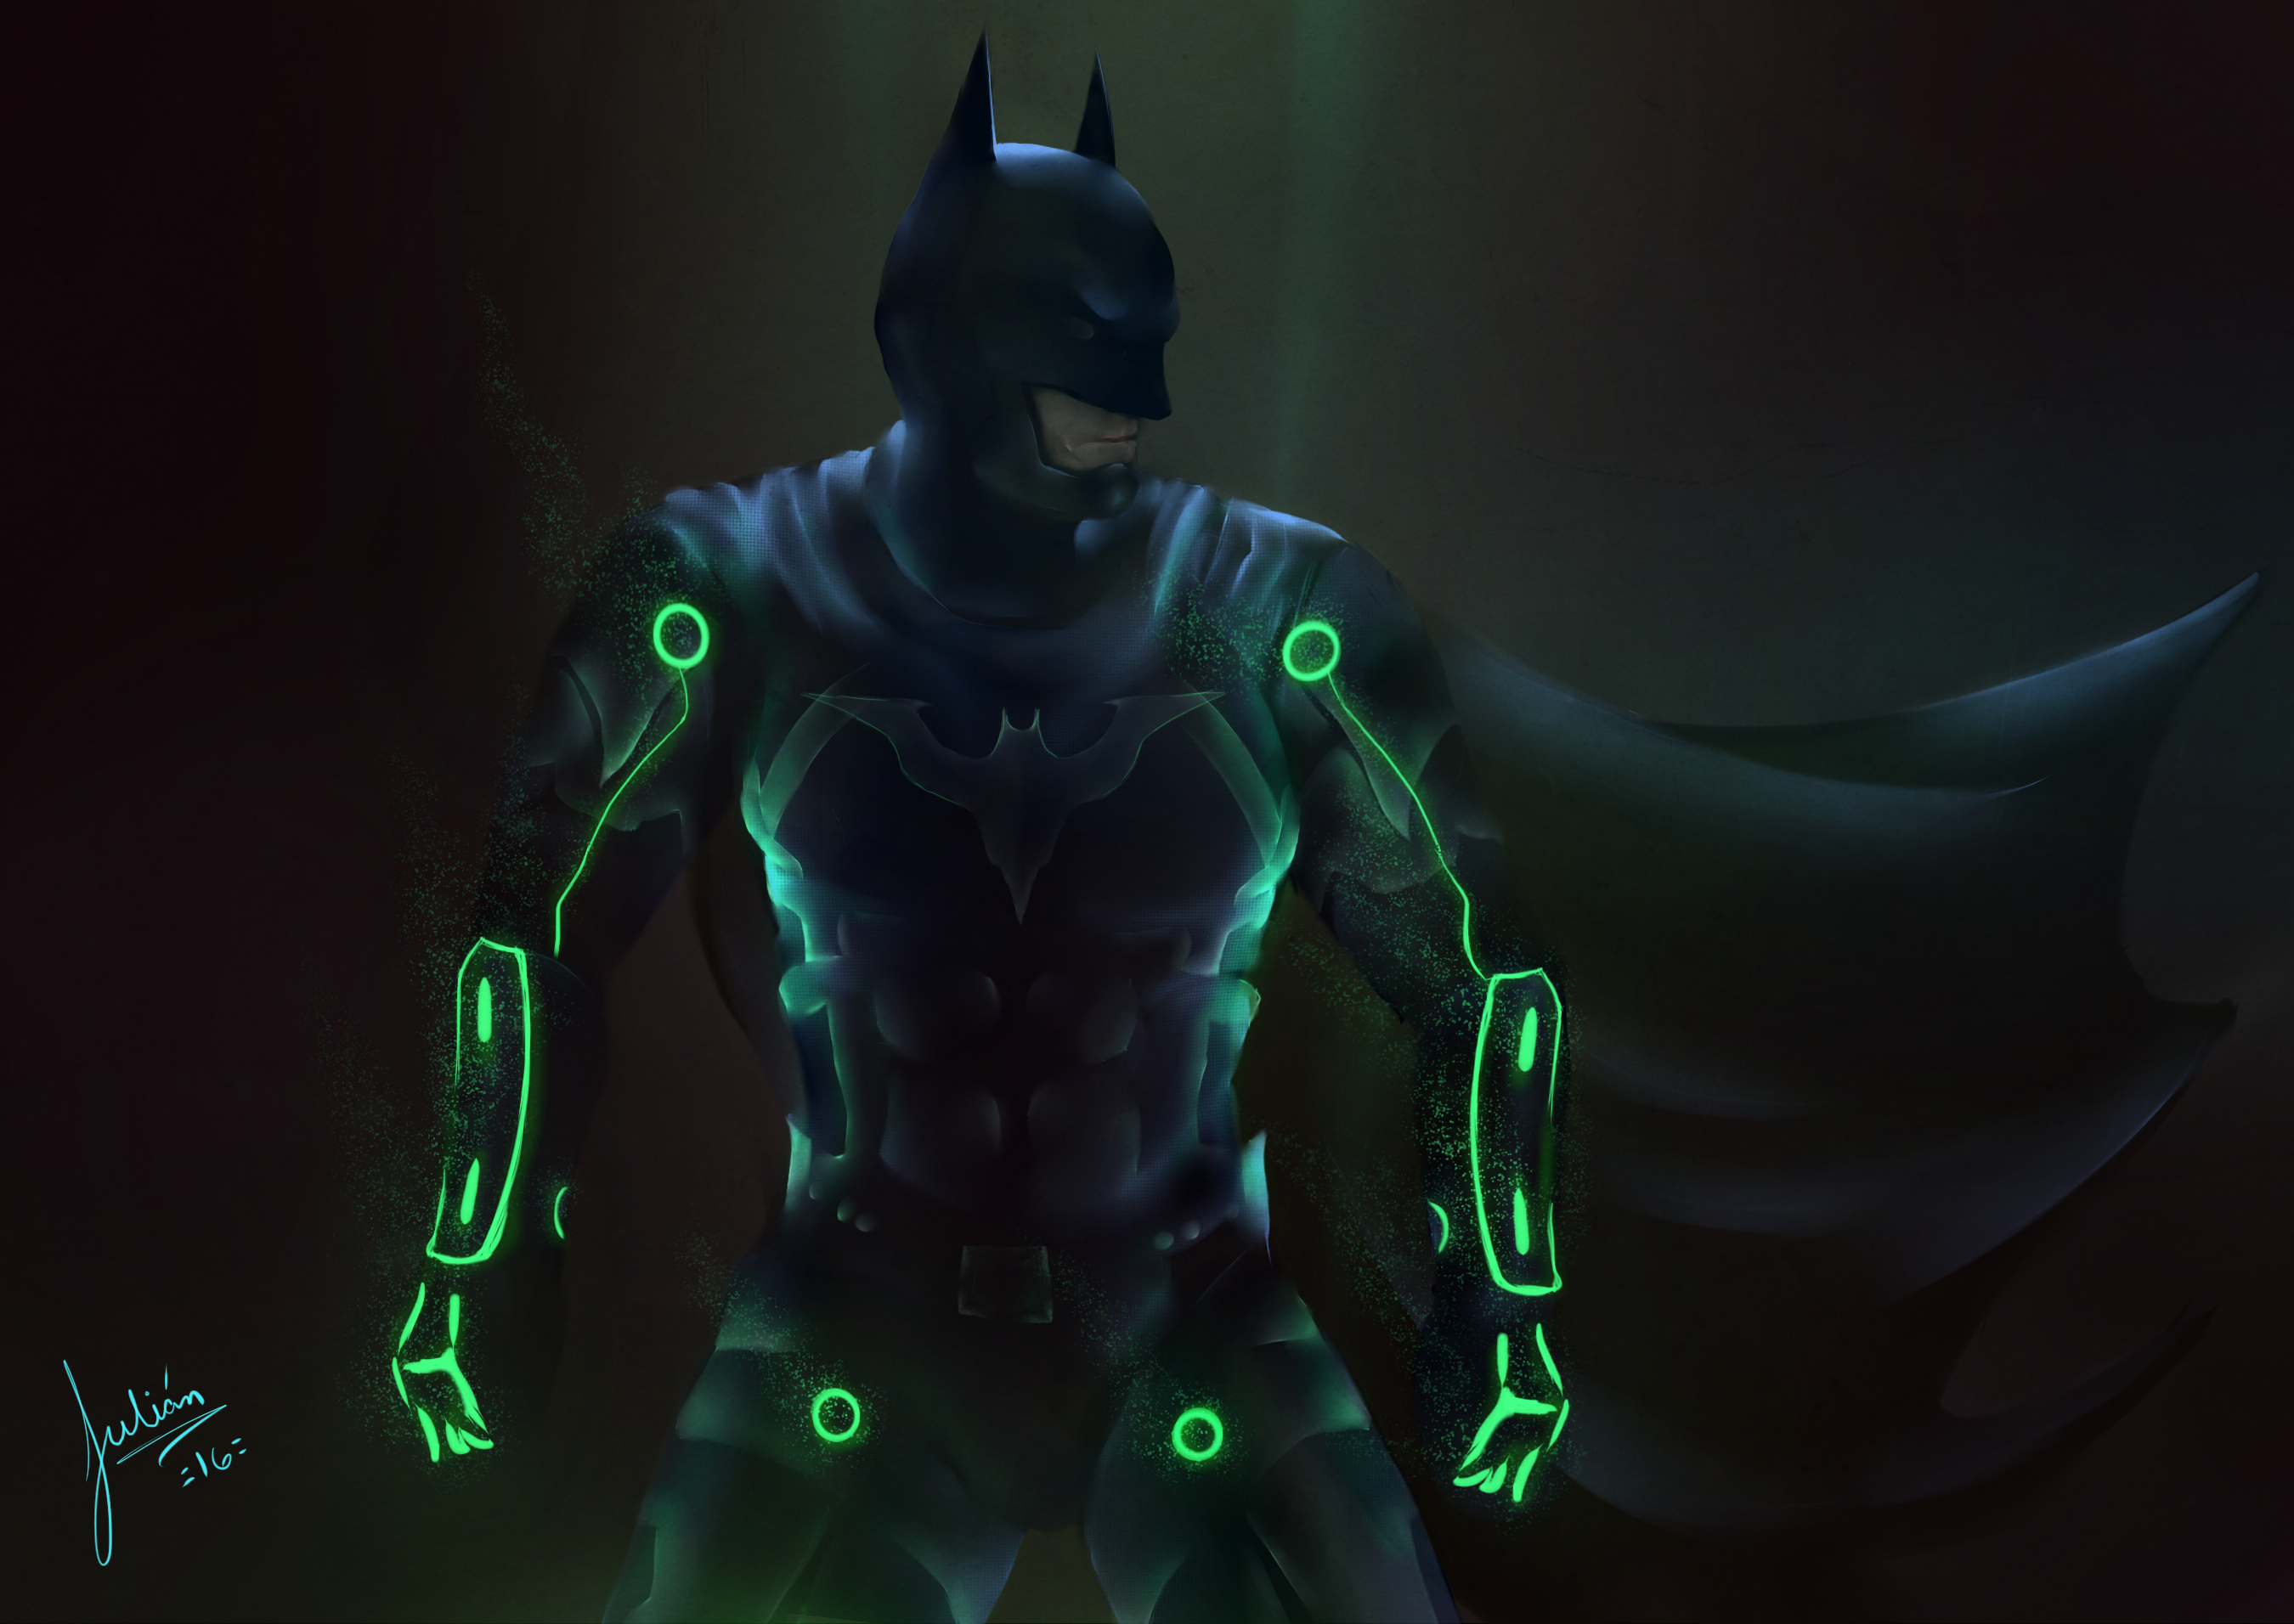 Wallpaper Batman in Injustice 2